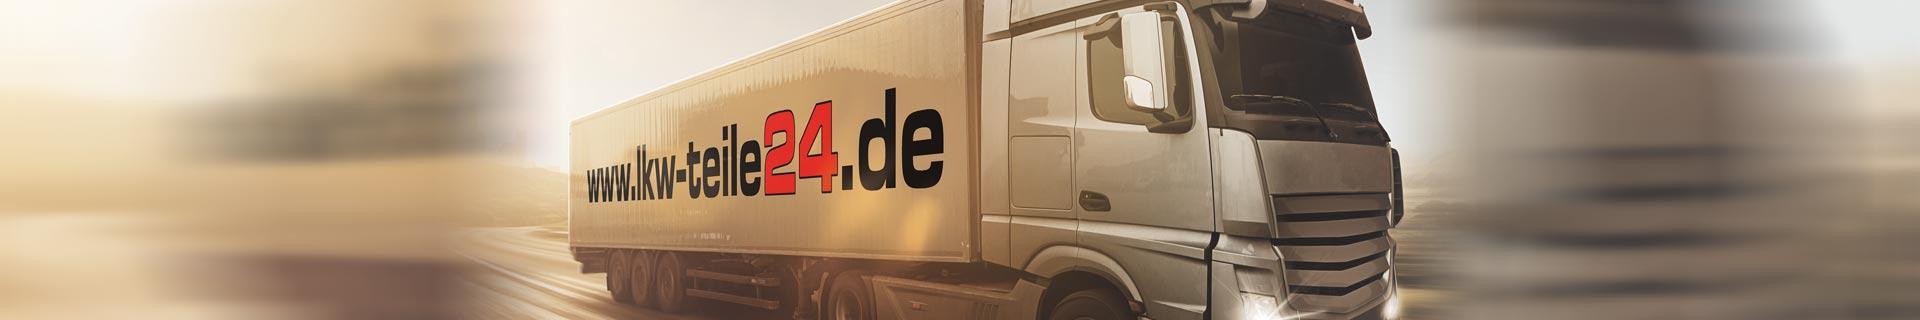 LKW-Teile24 Banner